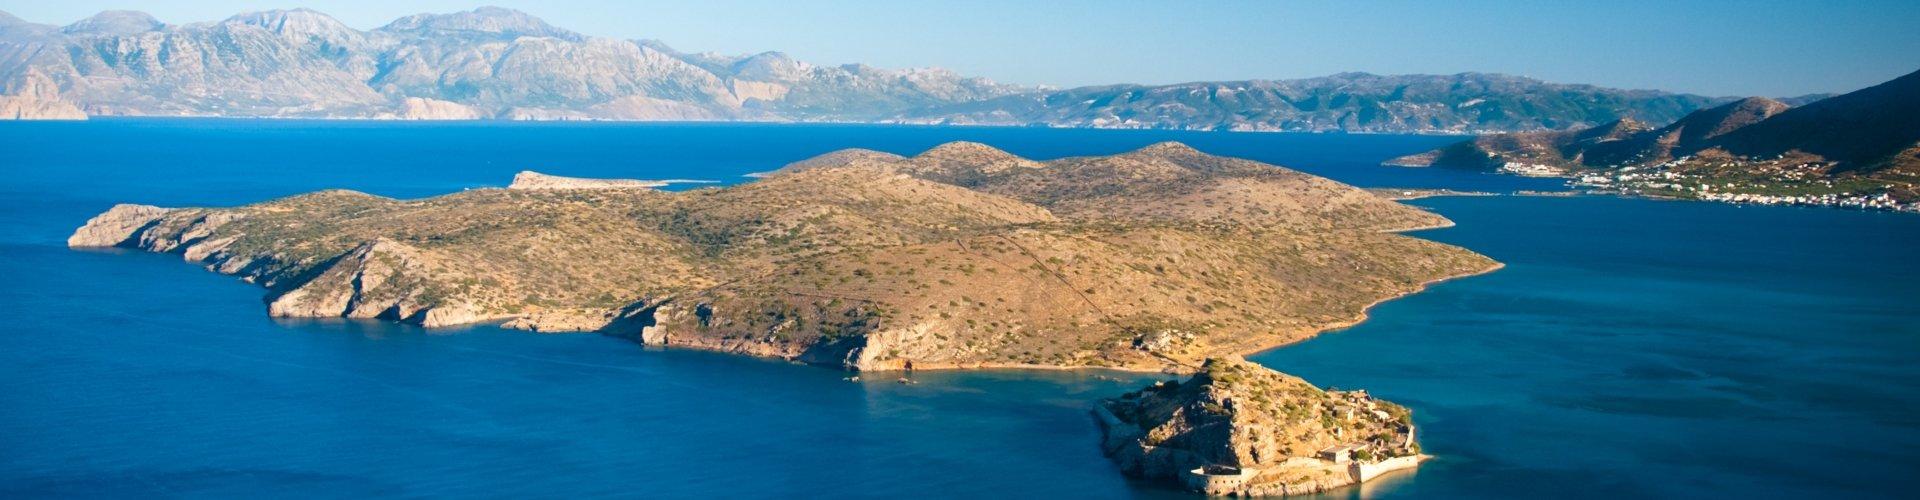 Ausflugsziel Insel Spinalonga